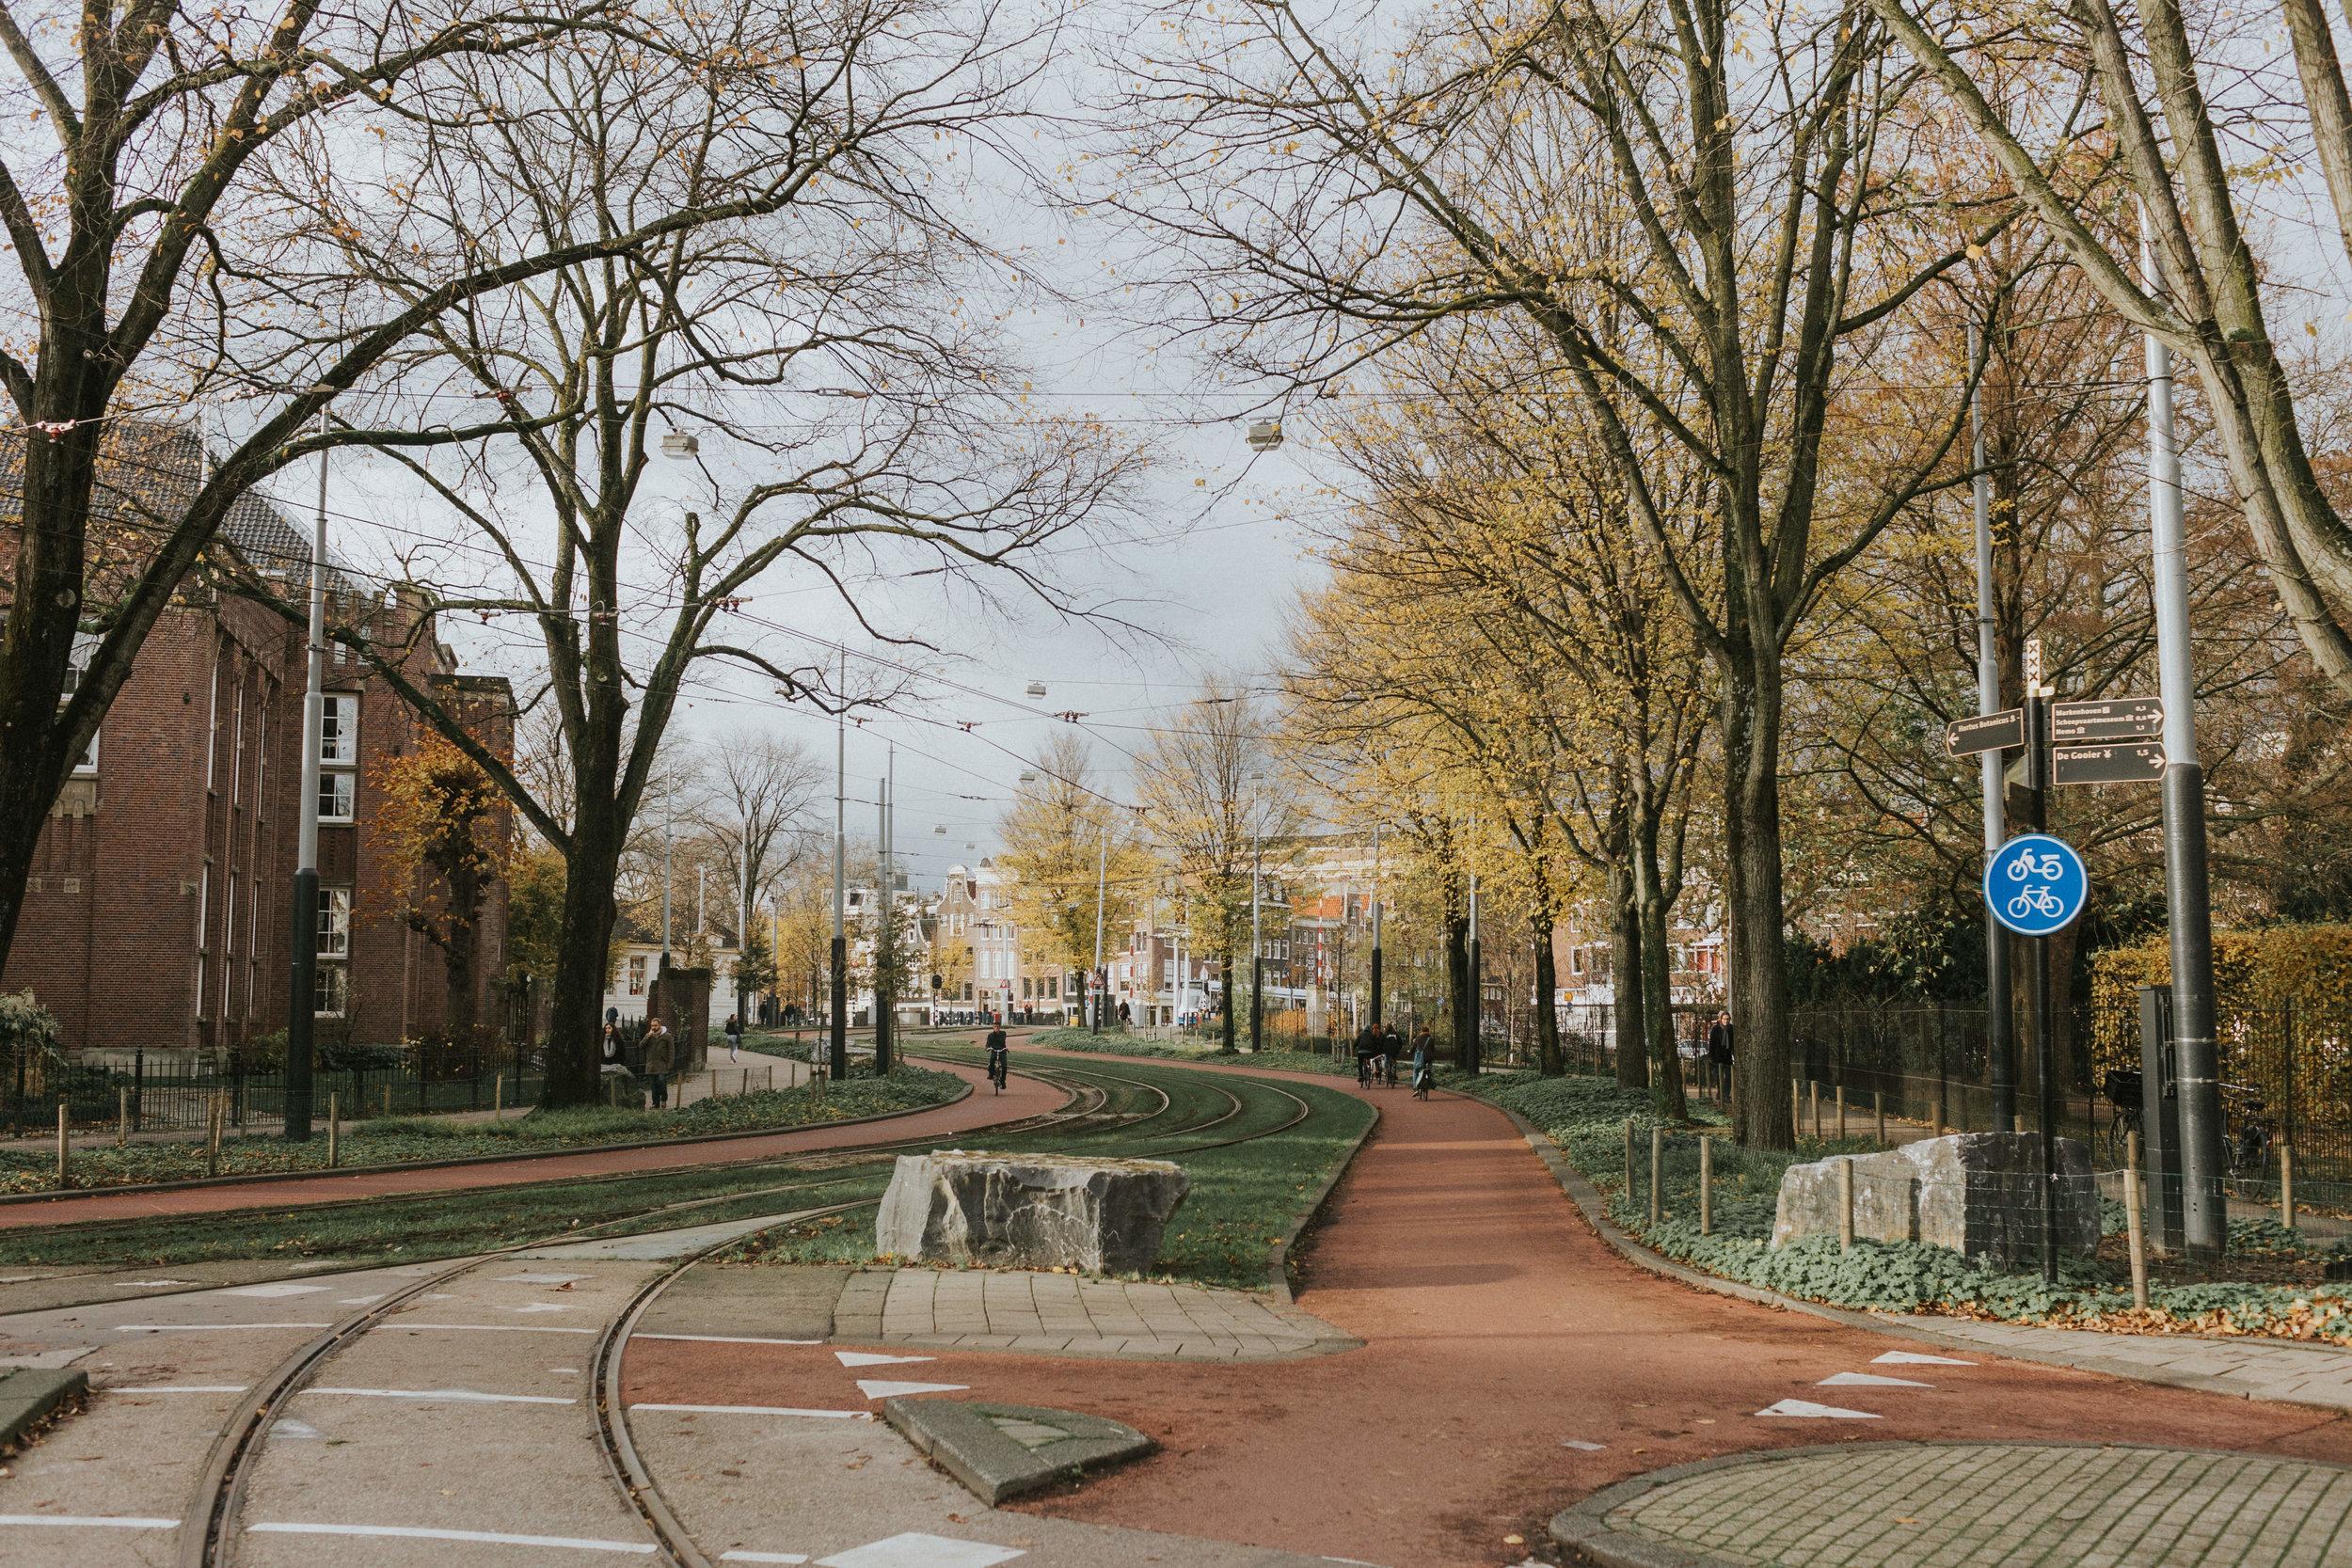 Walkway/Bikeway